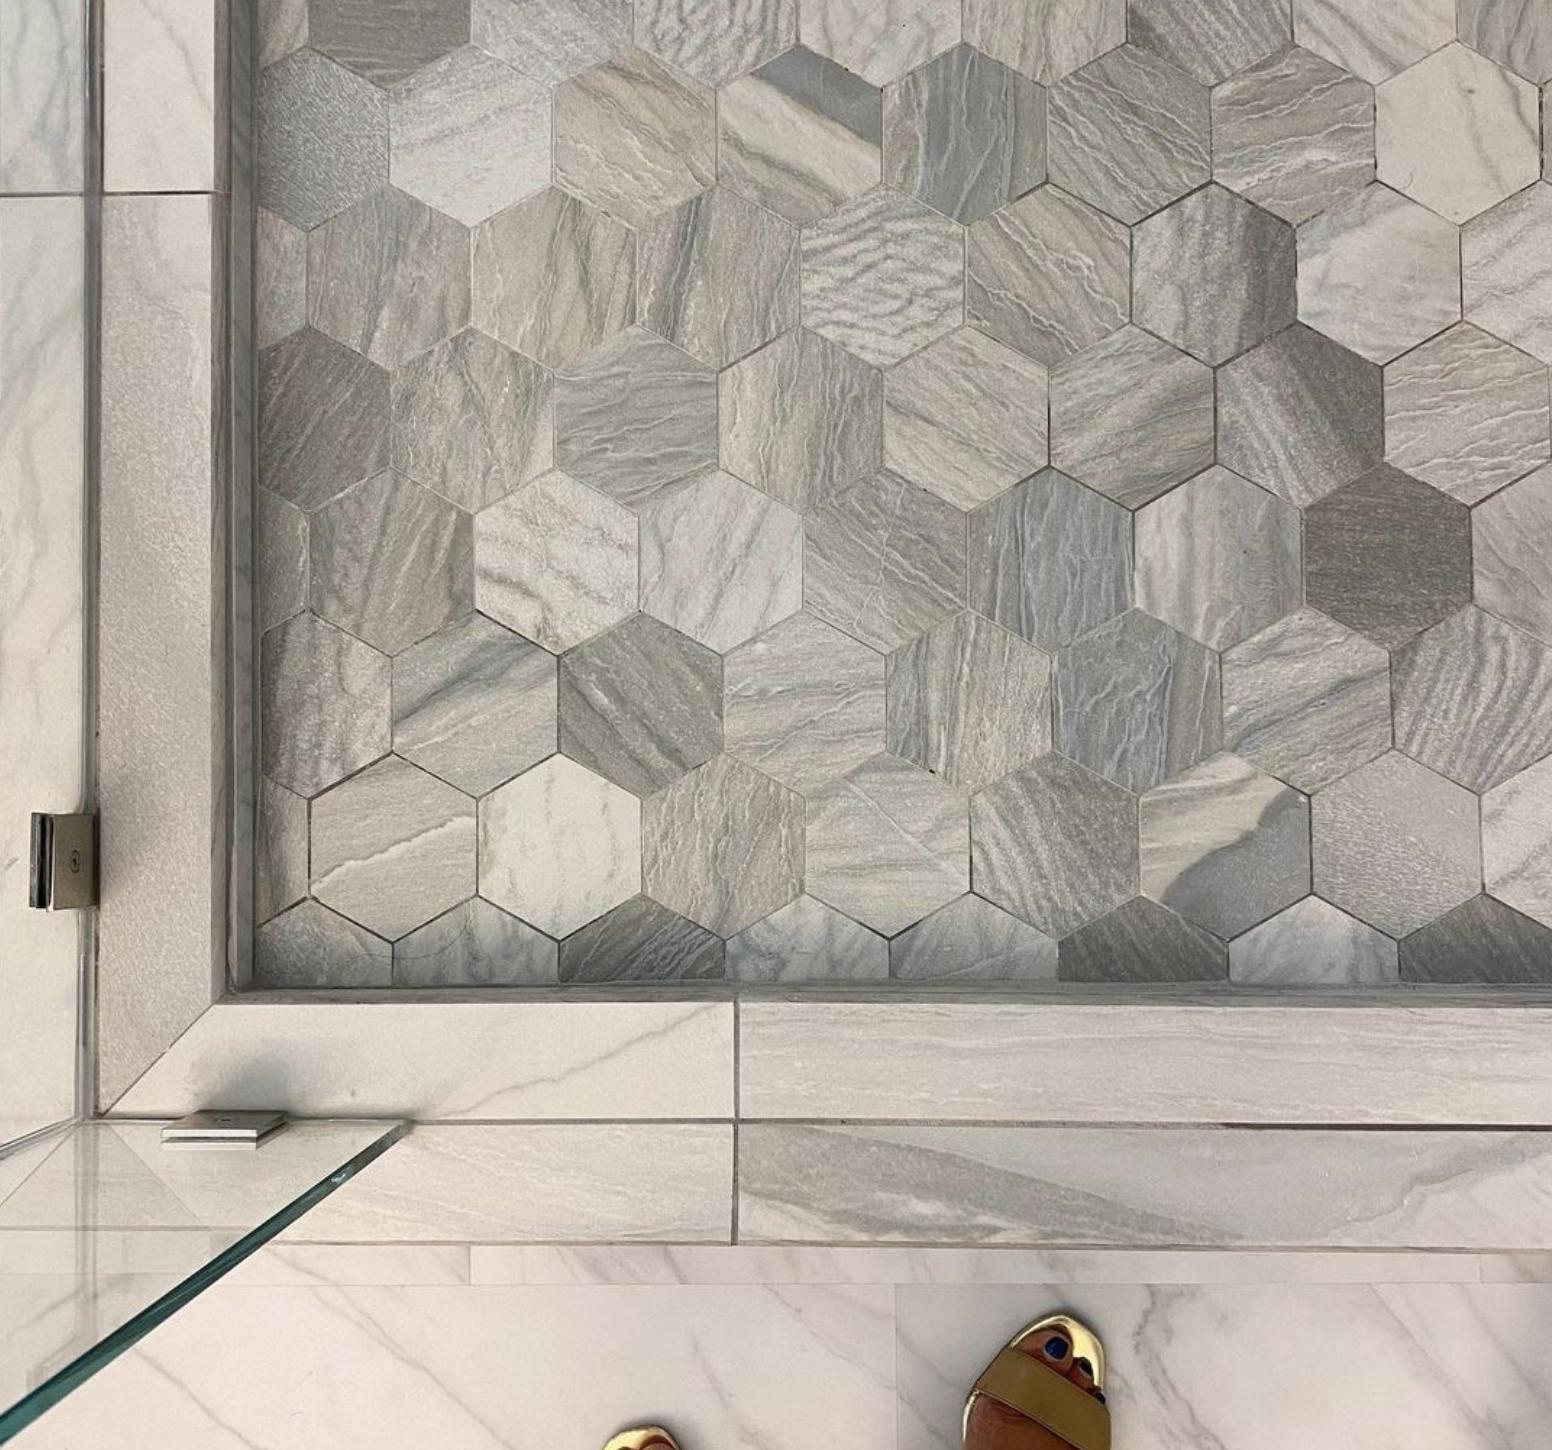 superior-construction-mt-juliet-tn-porcelain-vs-ceramic-hexogon-tile-in-shower-floor